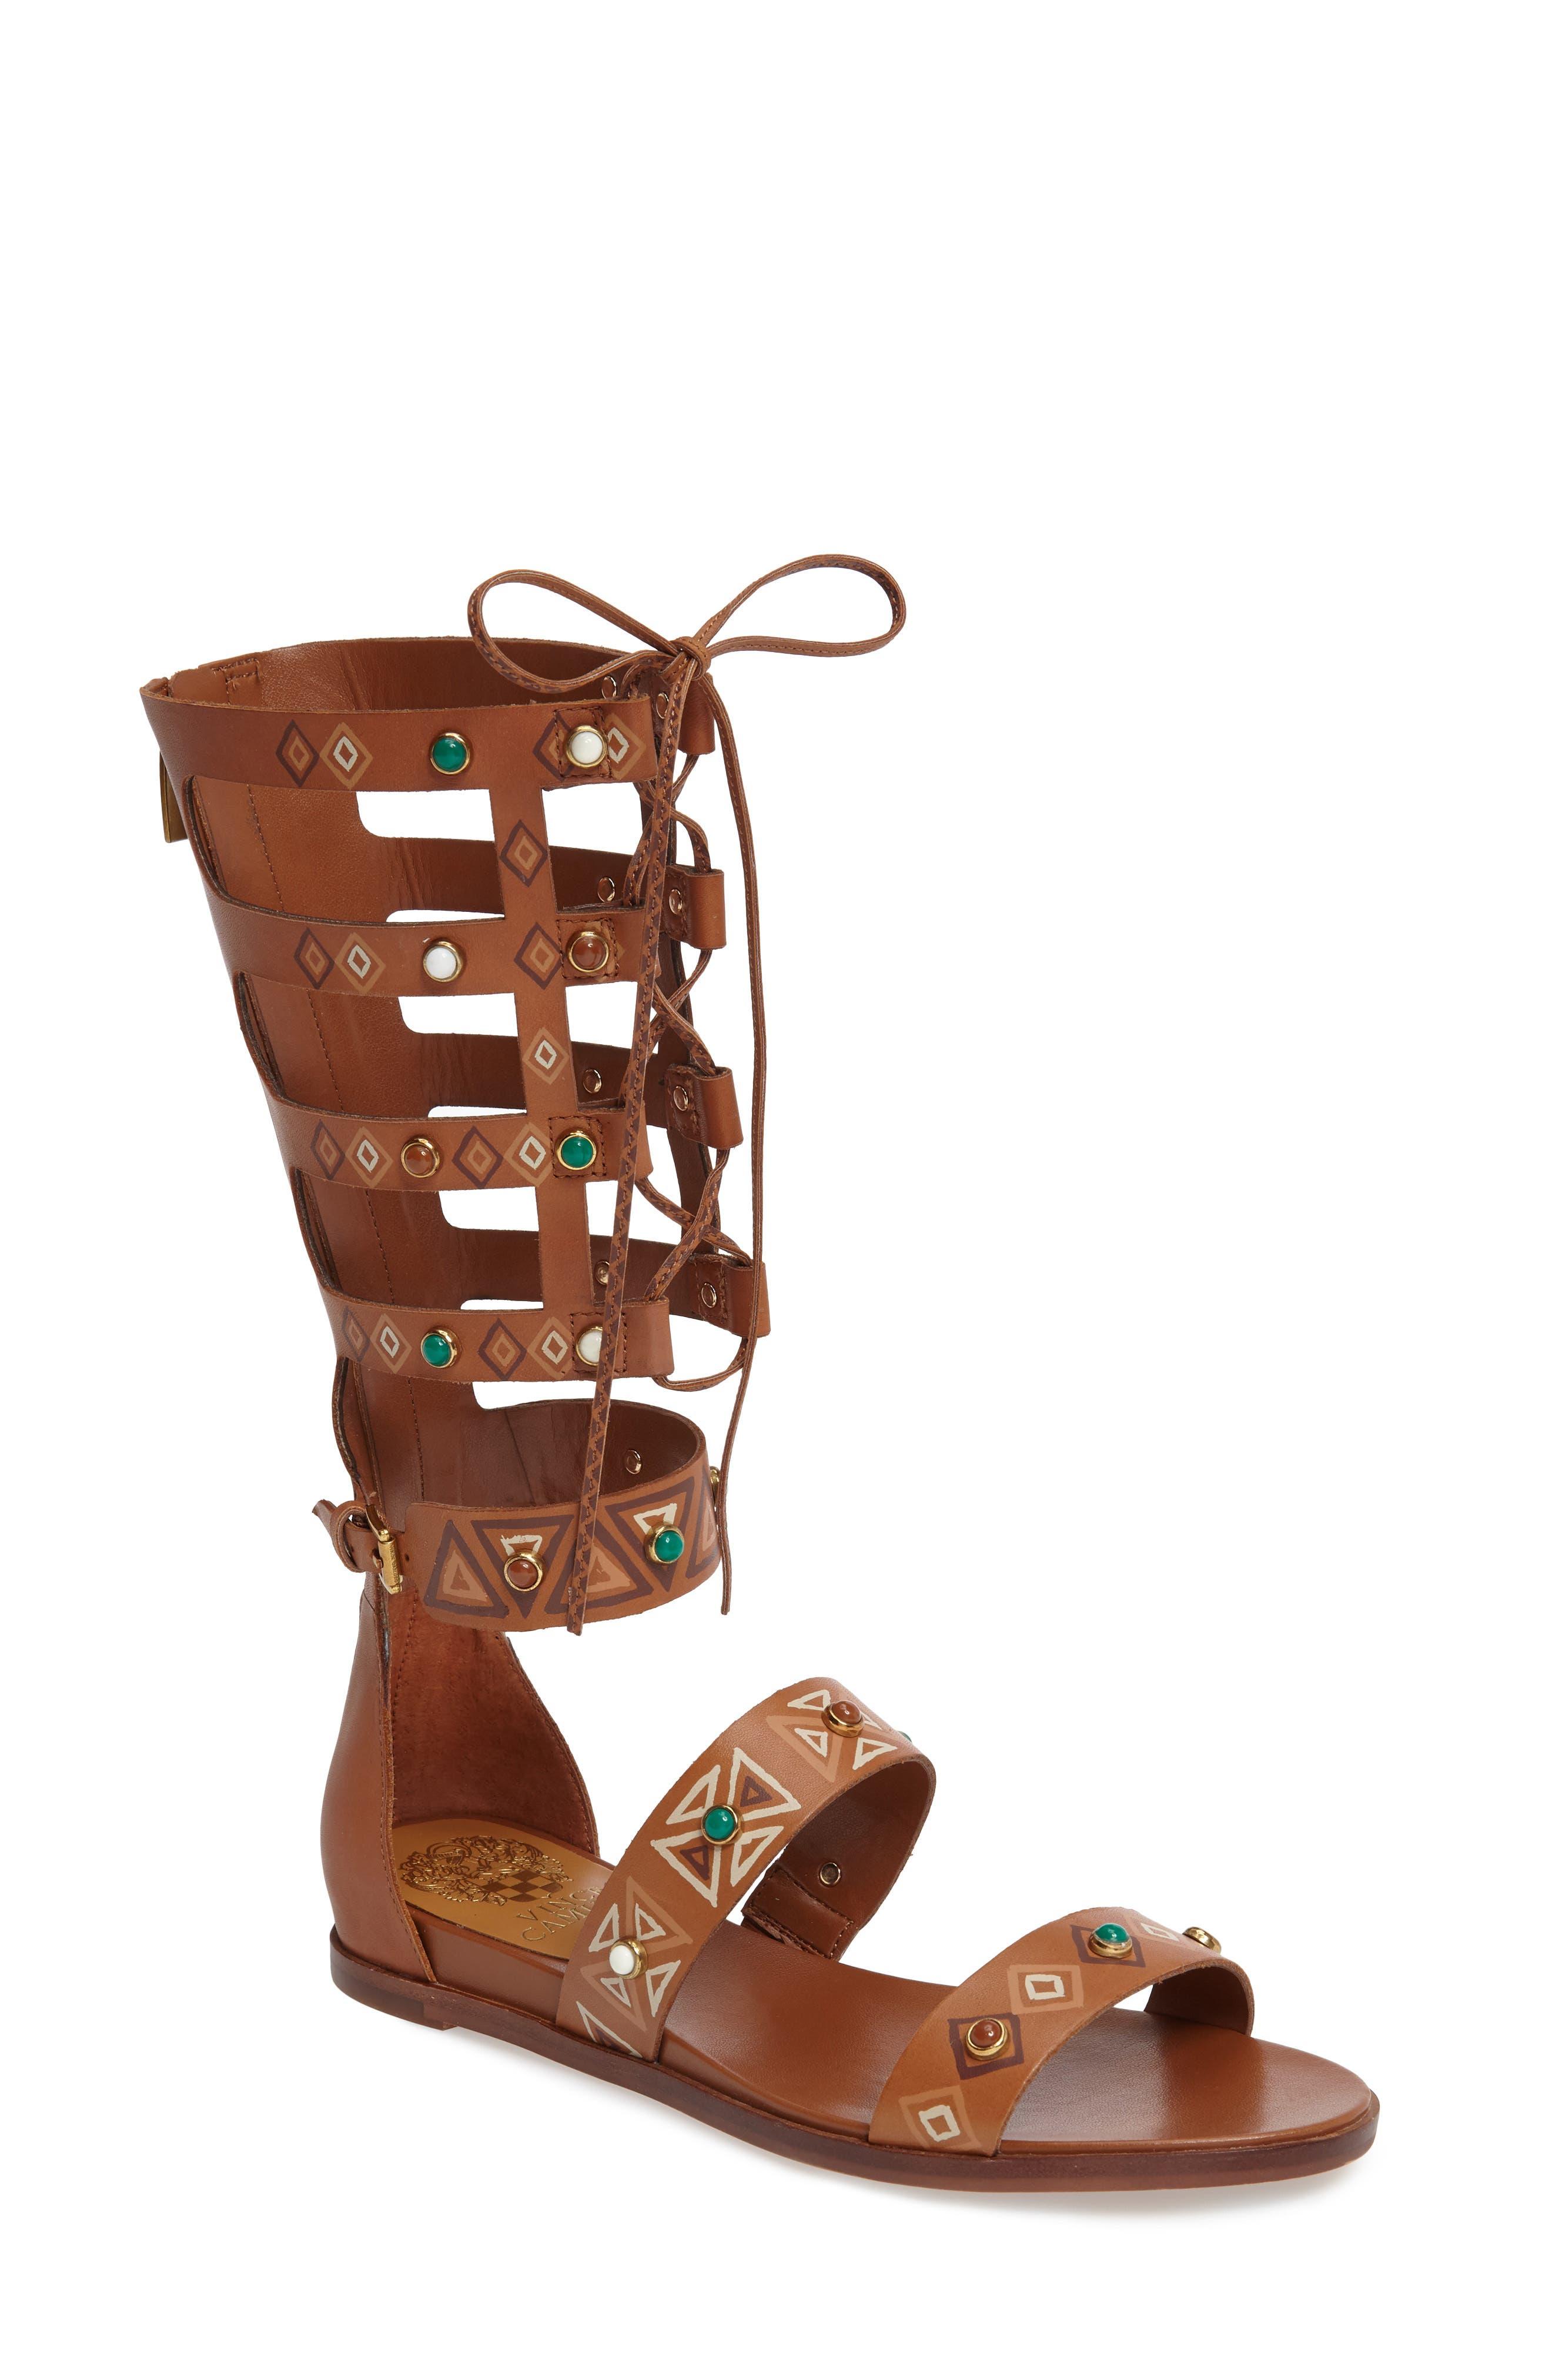 Main Image - Vince Camuto Shandon Gladiator Sandal (Women)